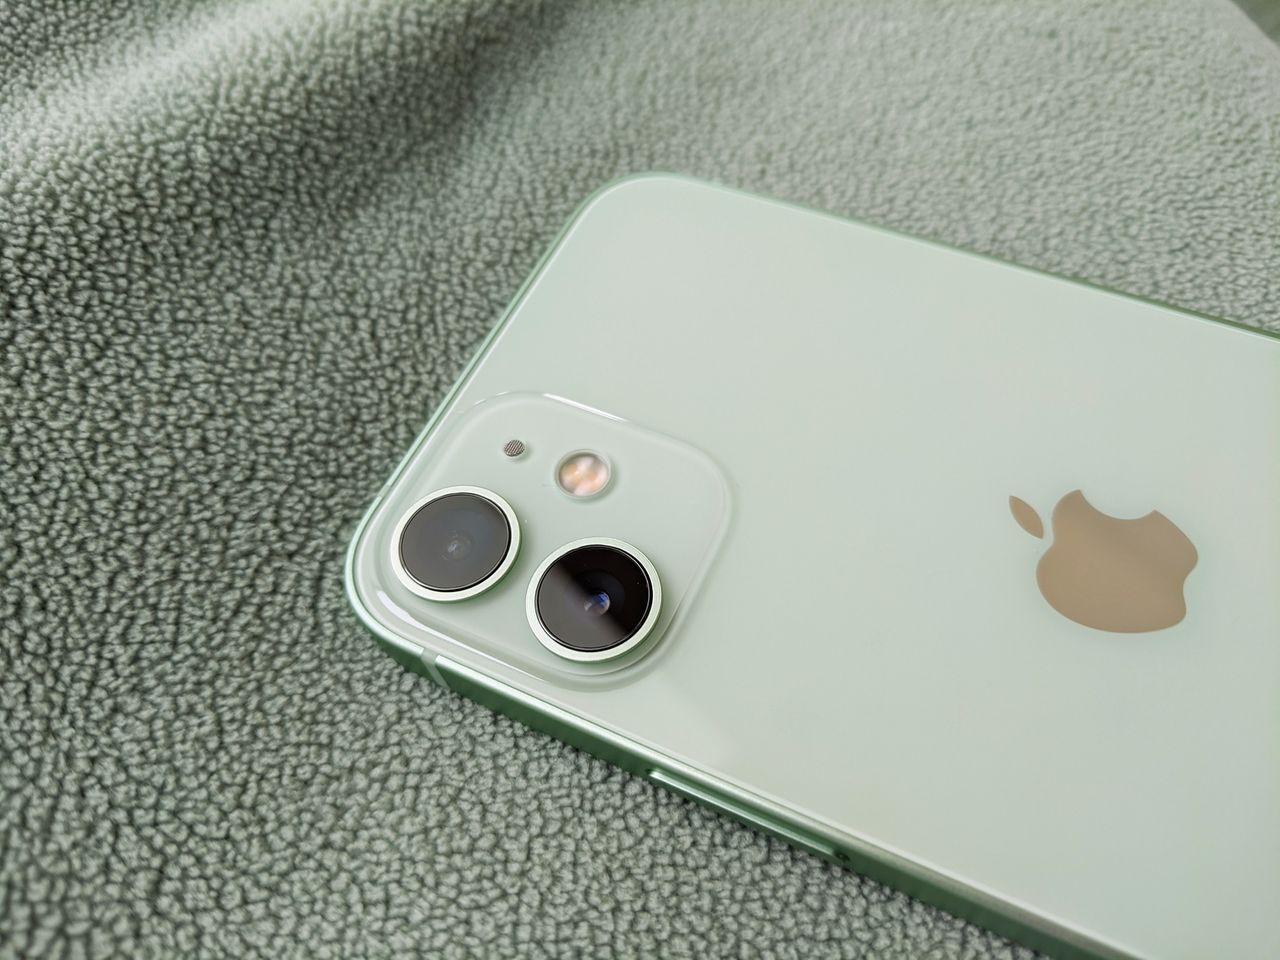 Årets iPhone-modeller ska få nya videofunktioner